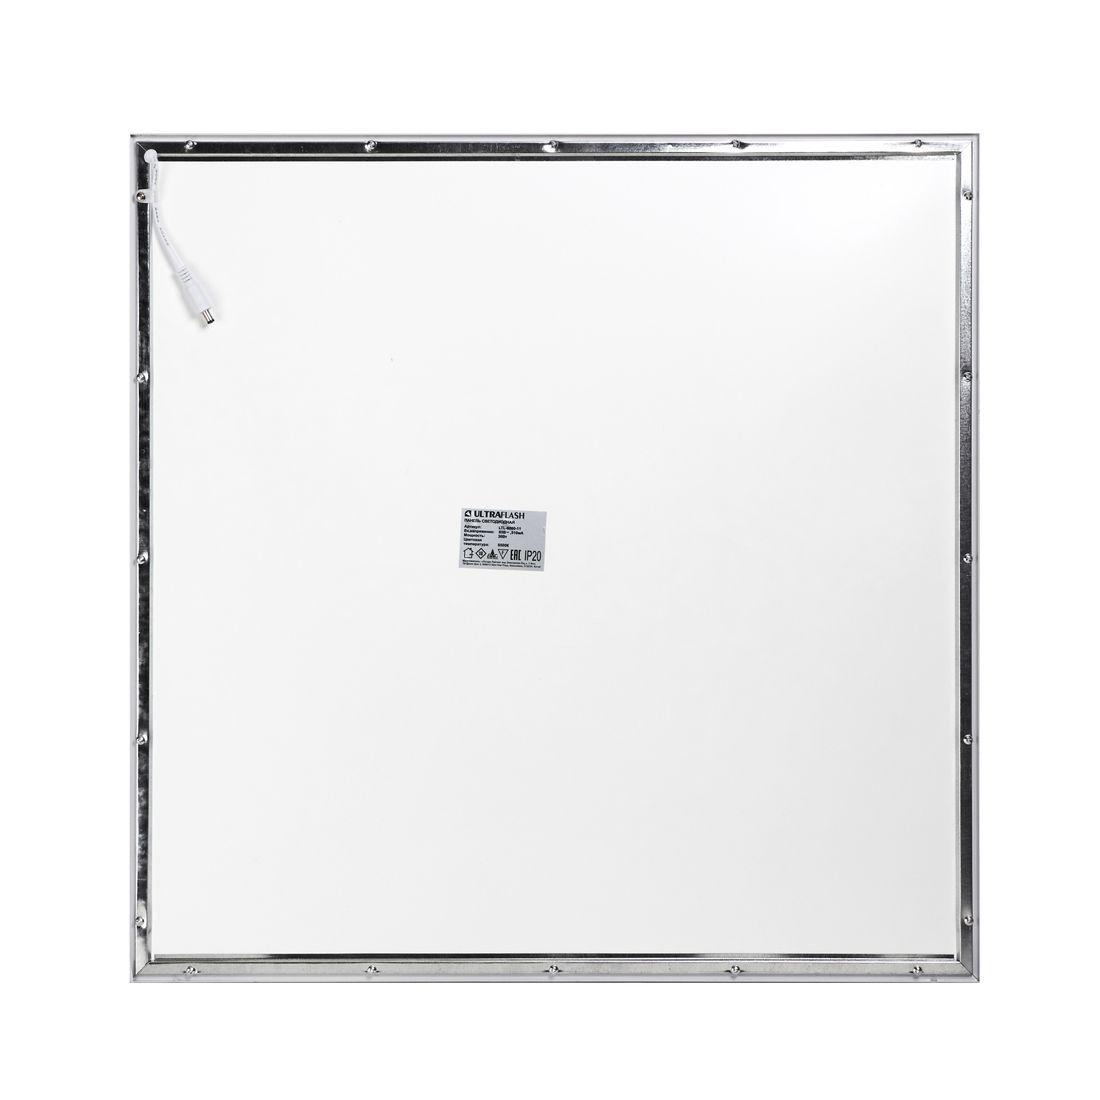 Ультратонкая LED панель Ultraflash LTL-6060-11 (13551) (36Вт., 6500К)